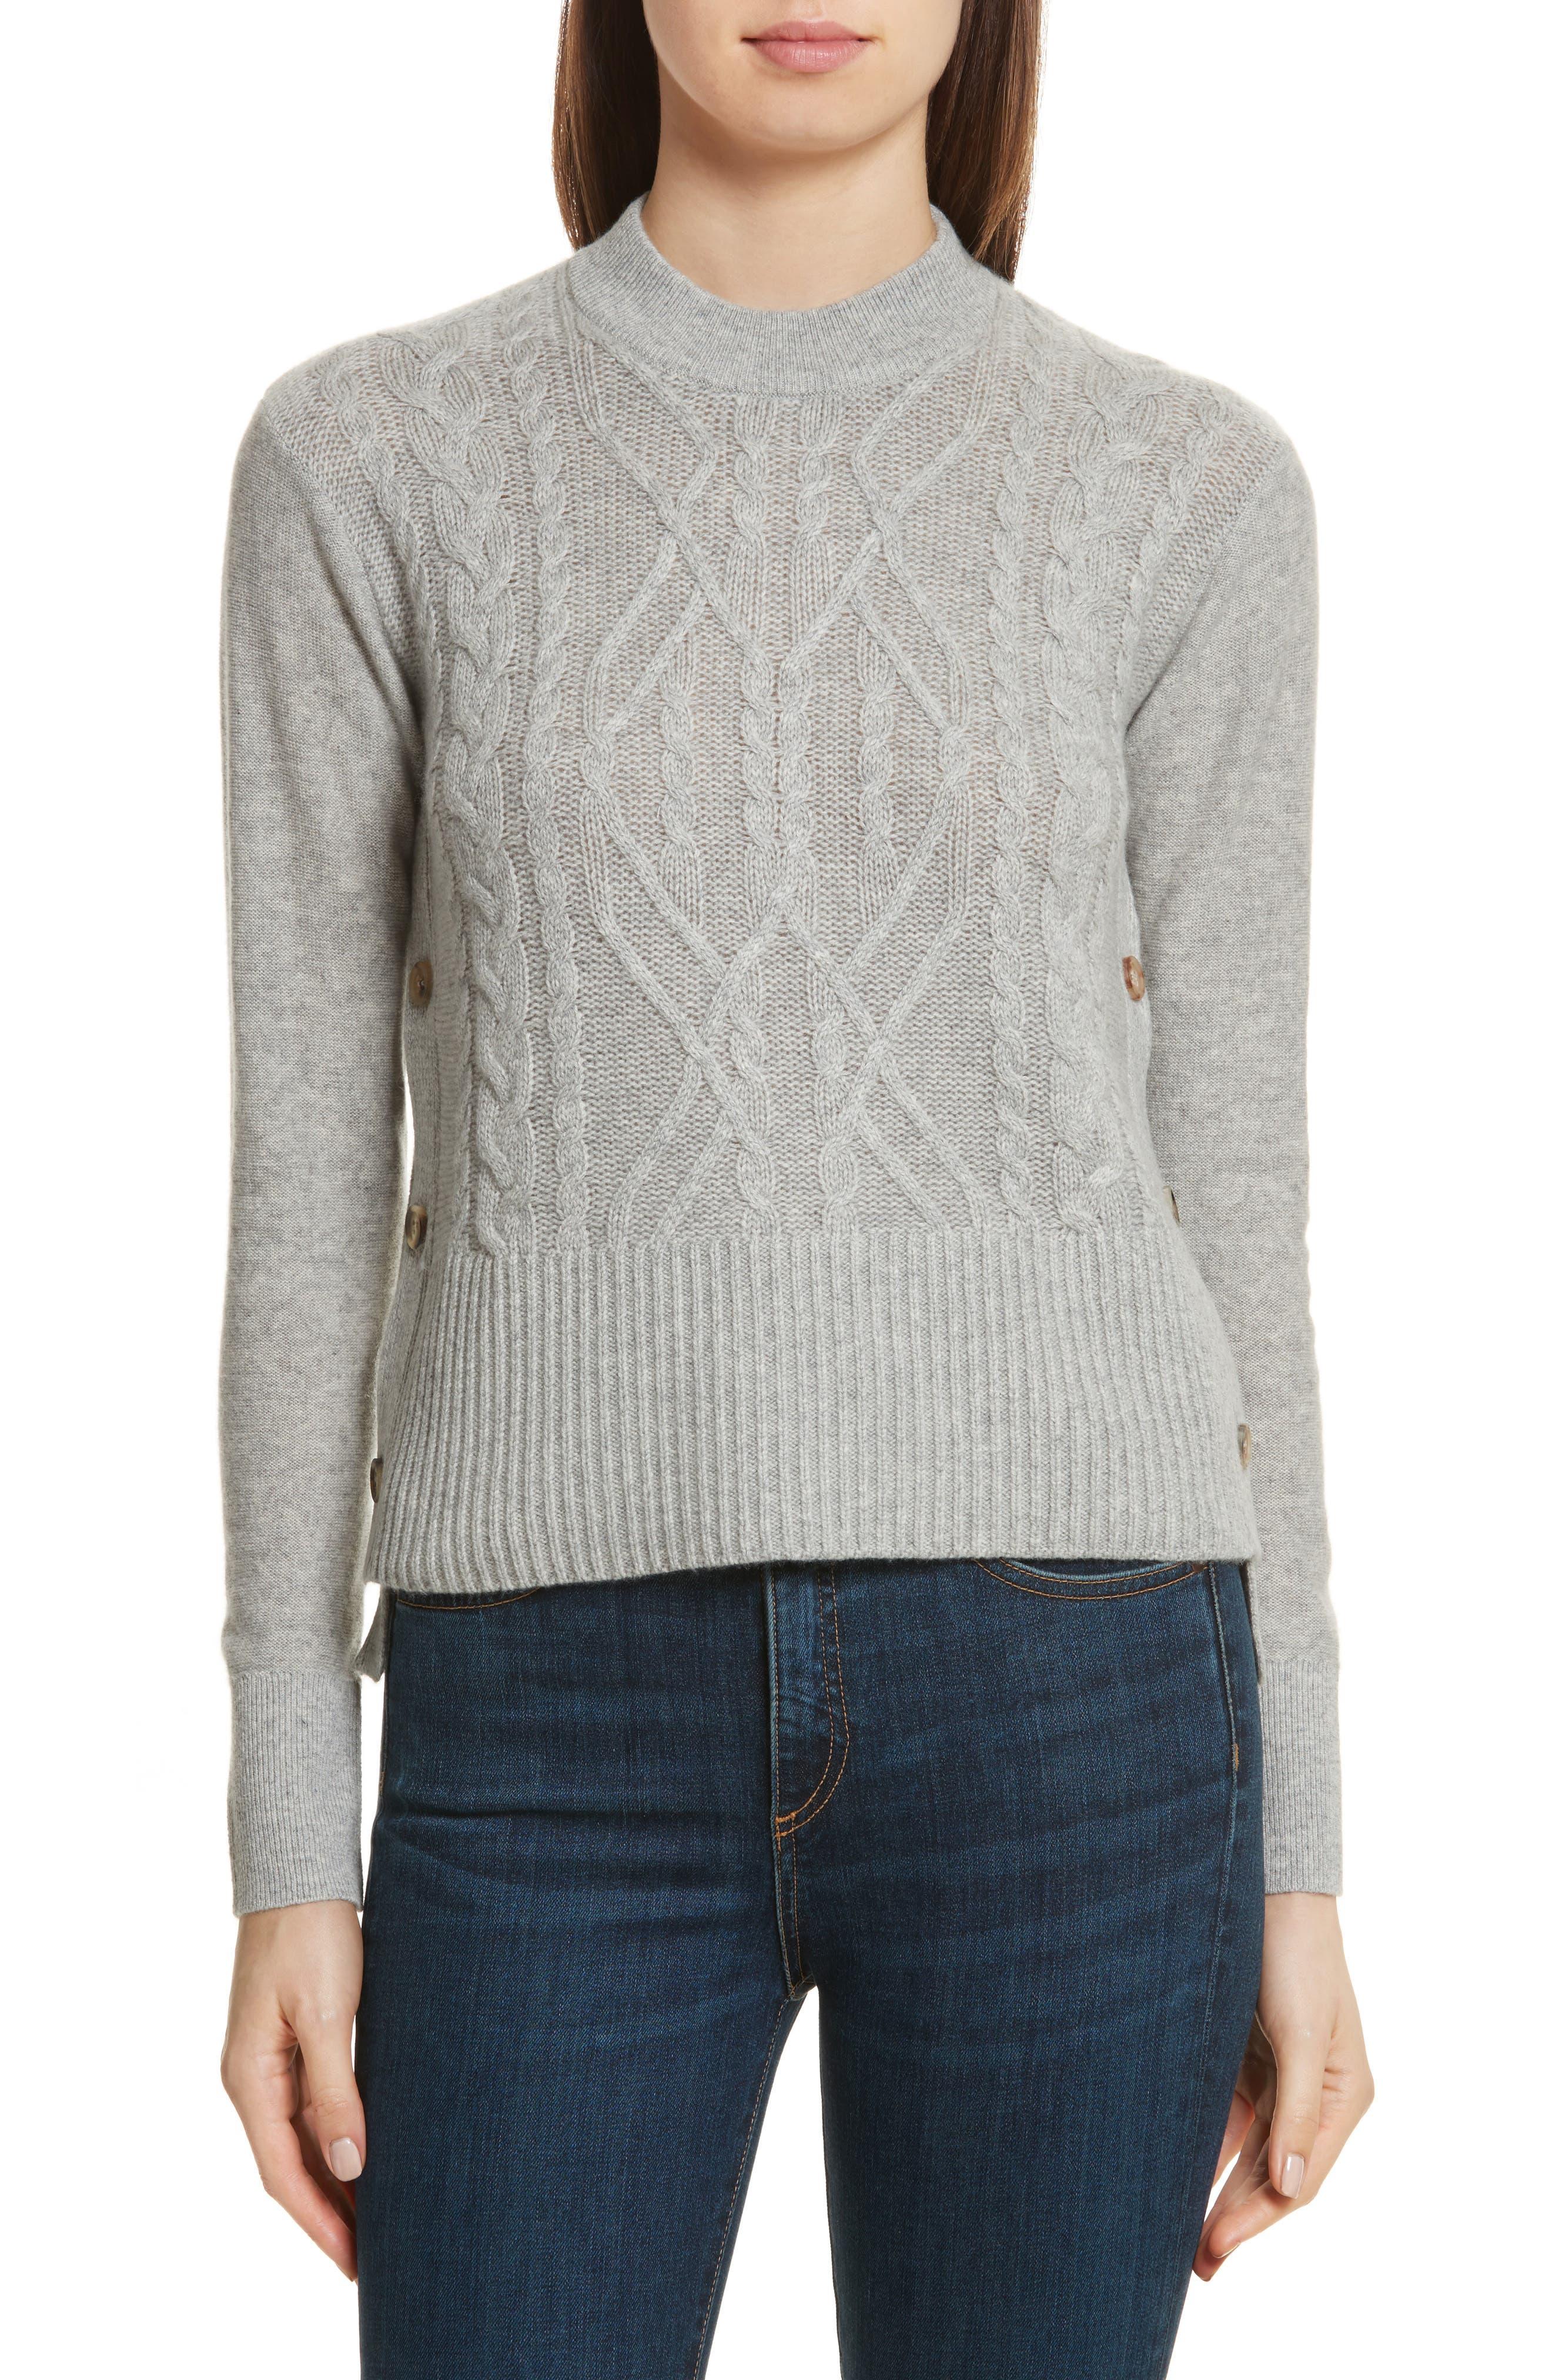 Alternate Image 1 Selected - Veronica Beard Kenna Cashmere Sweater